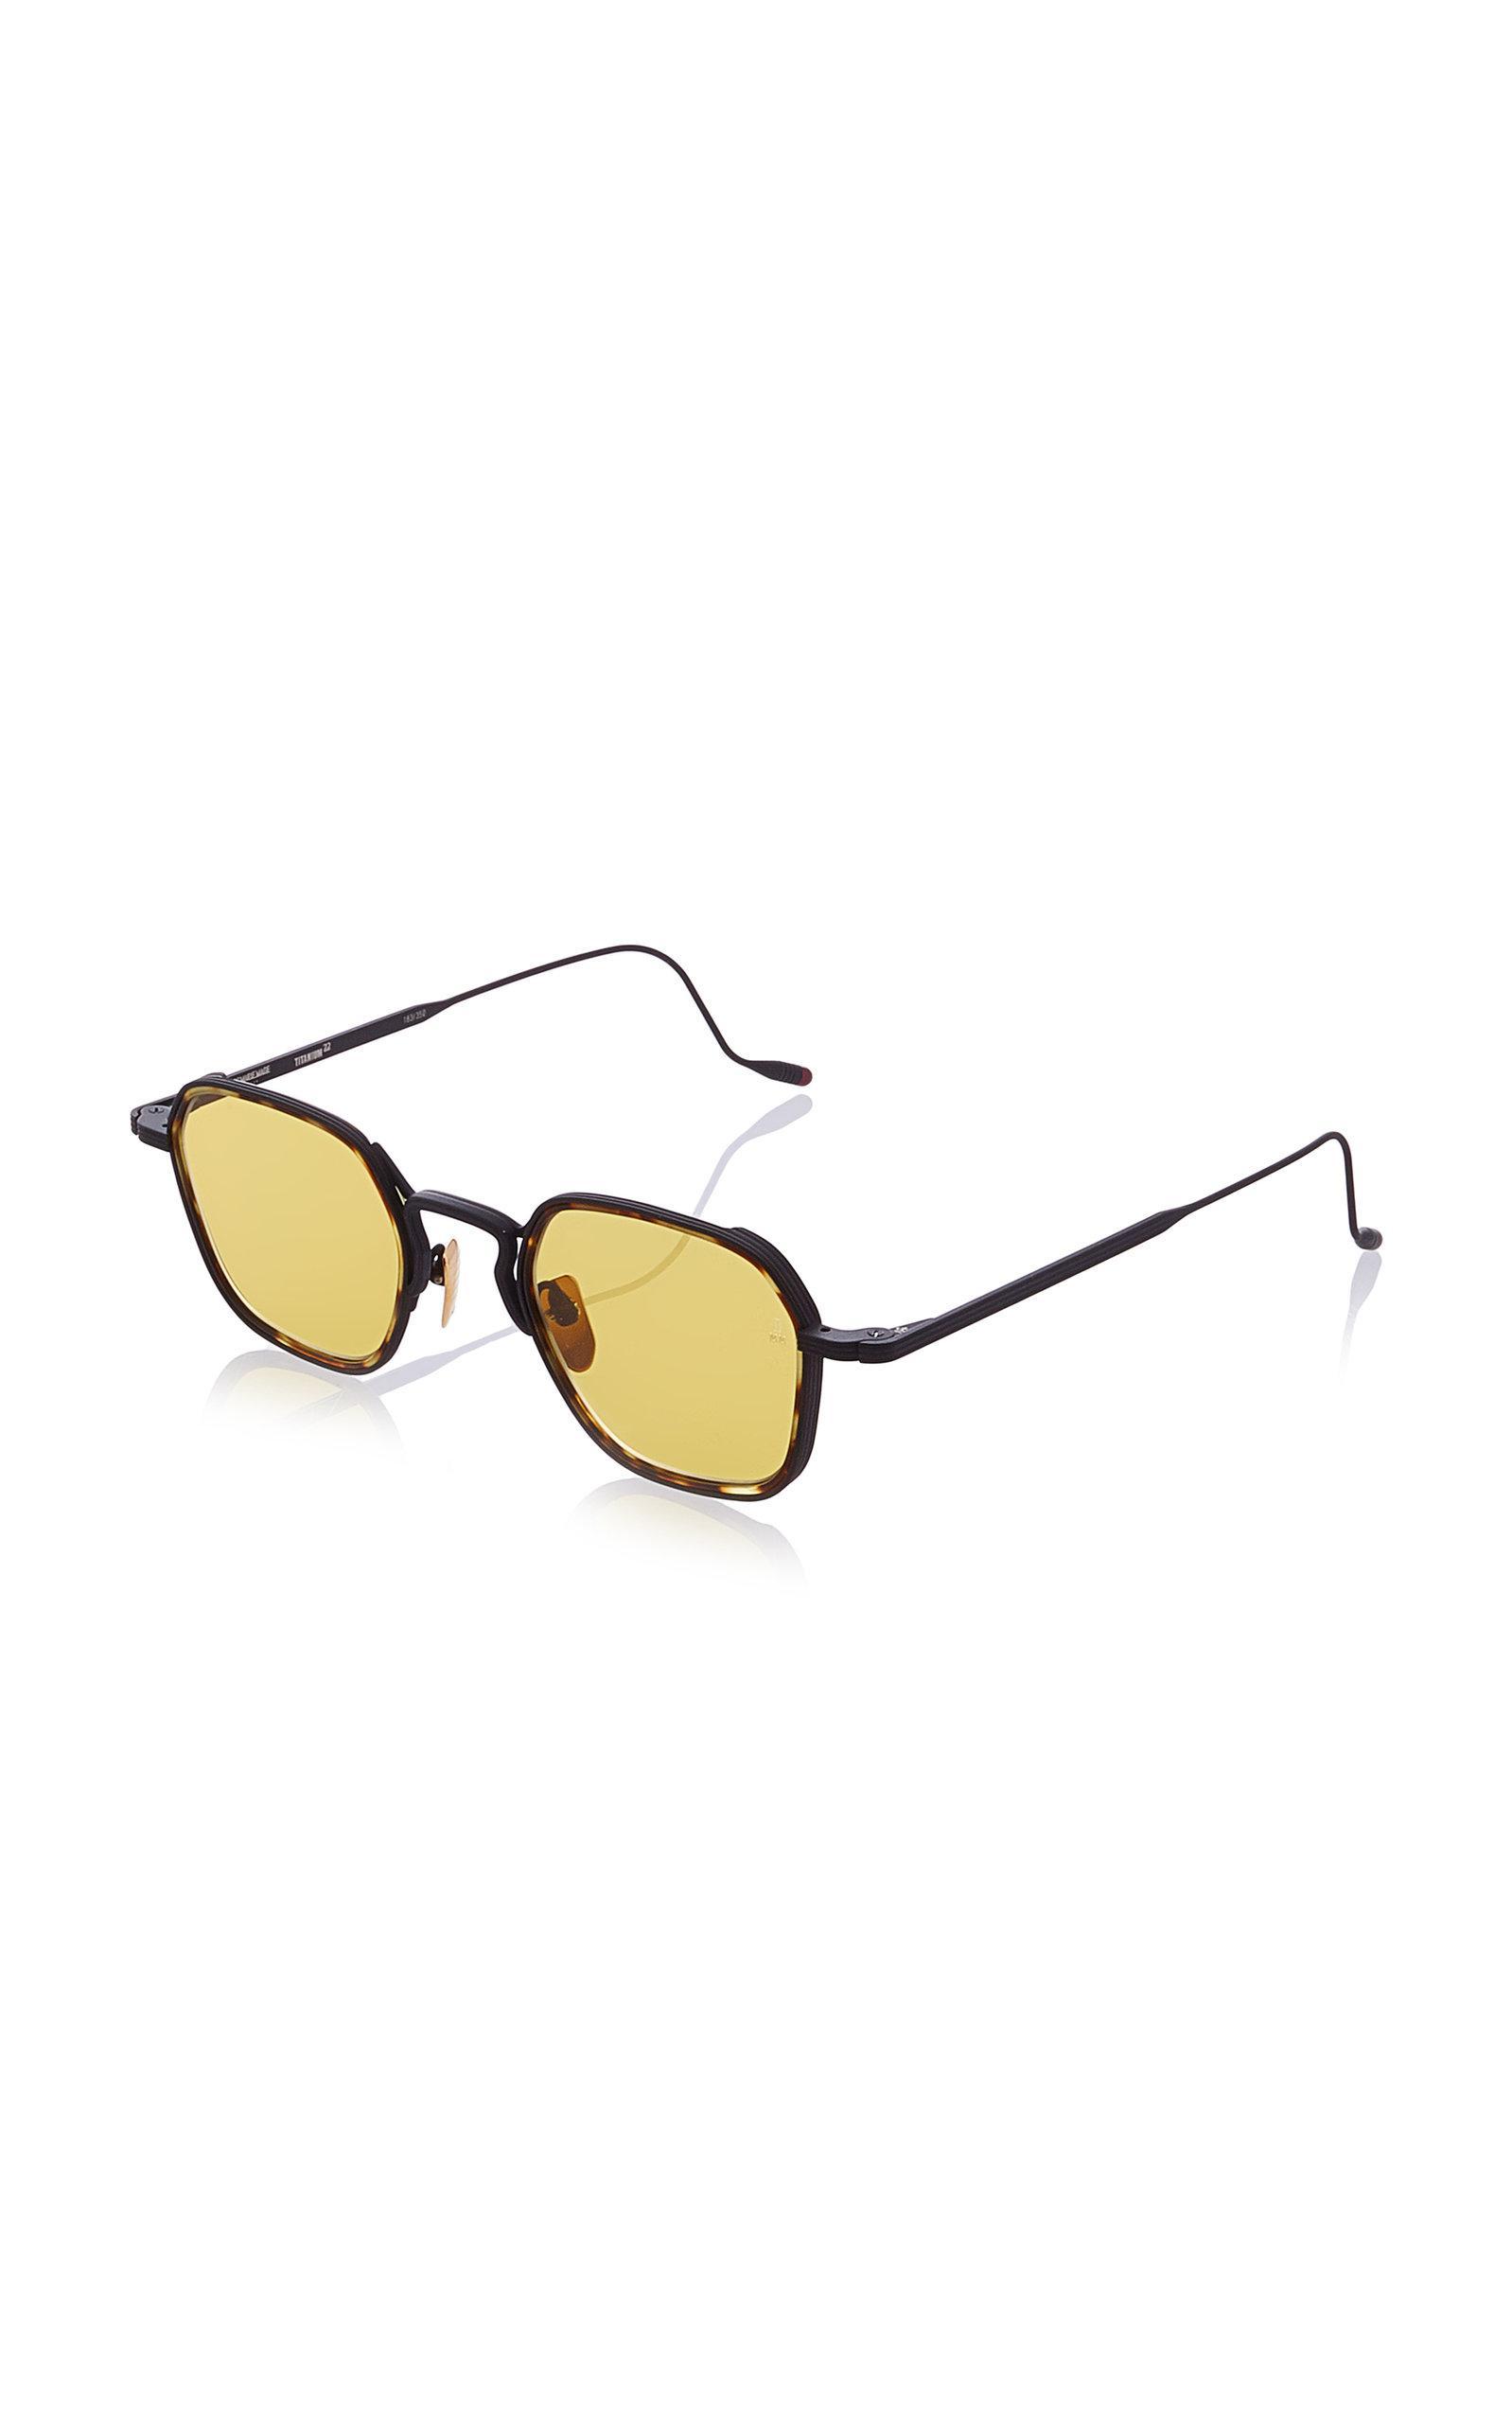 a8f2b86035 Jacques Marie Mage Wyatt Hexagon-frame Tortoiseshell Wire Sunglasses ...